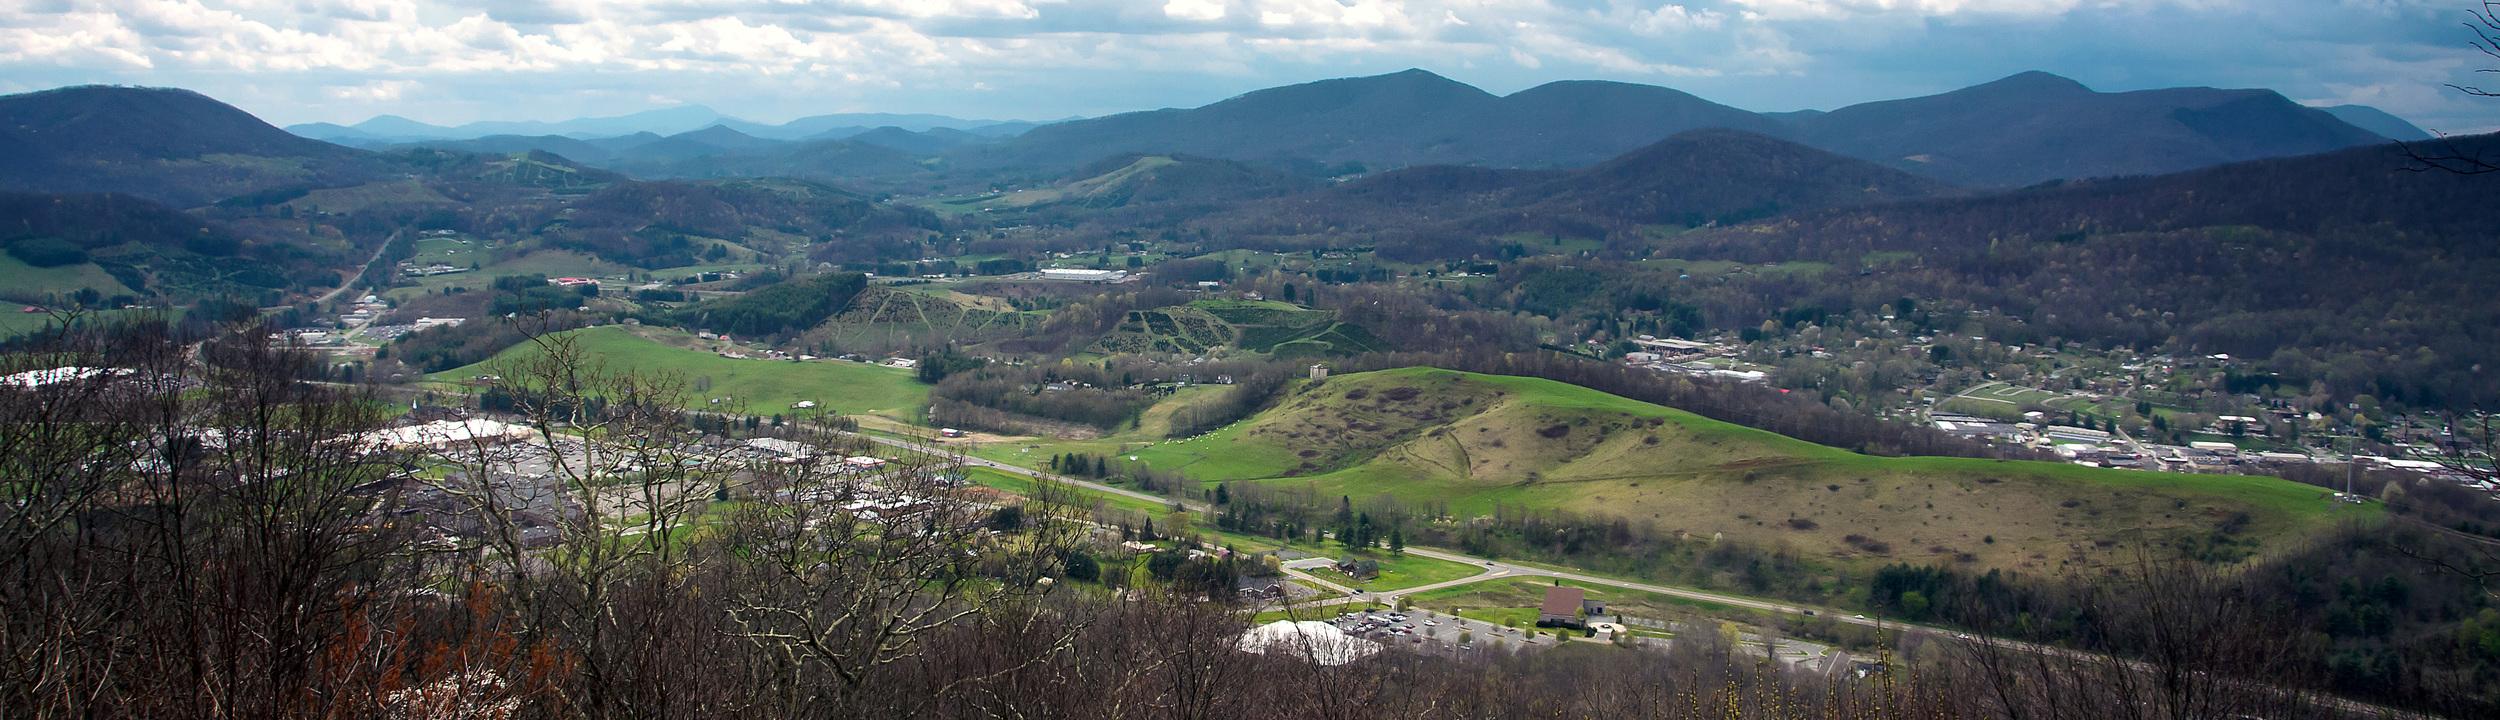 NCDH Mt Jefferson View